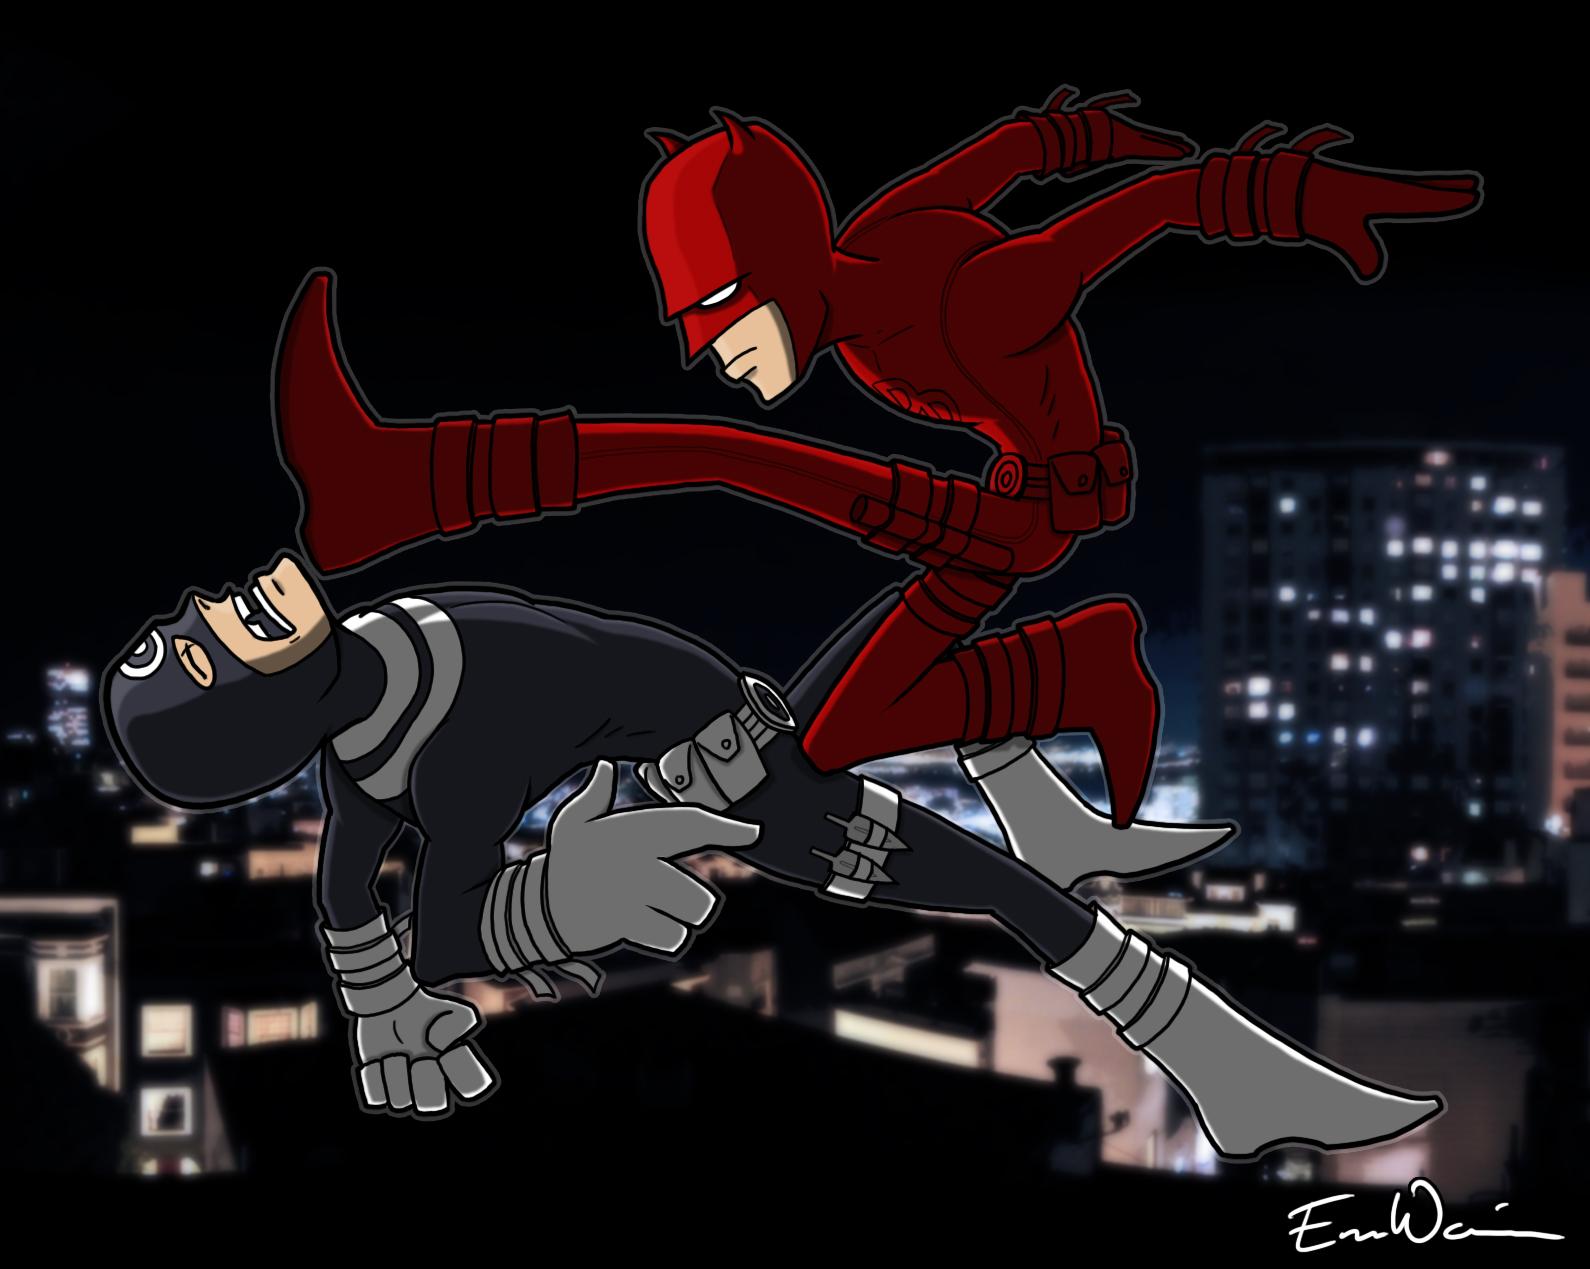 Daredevil kicks ass